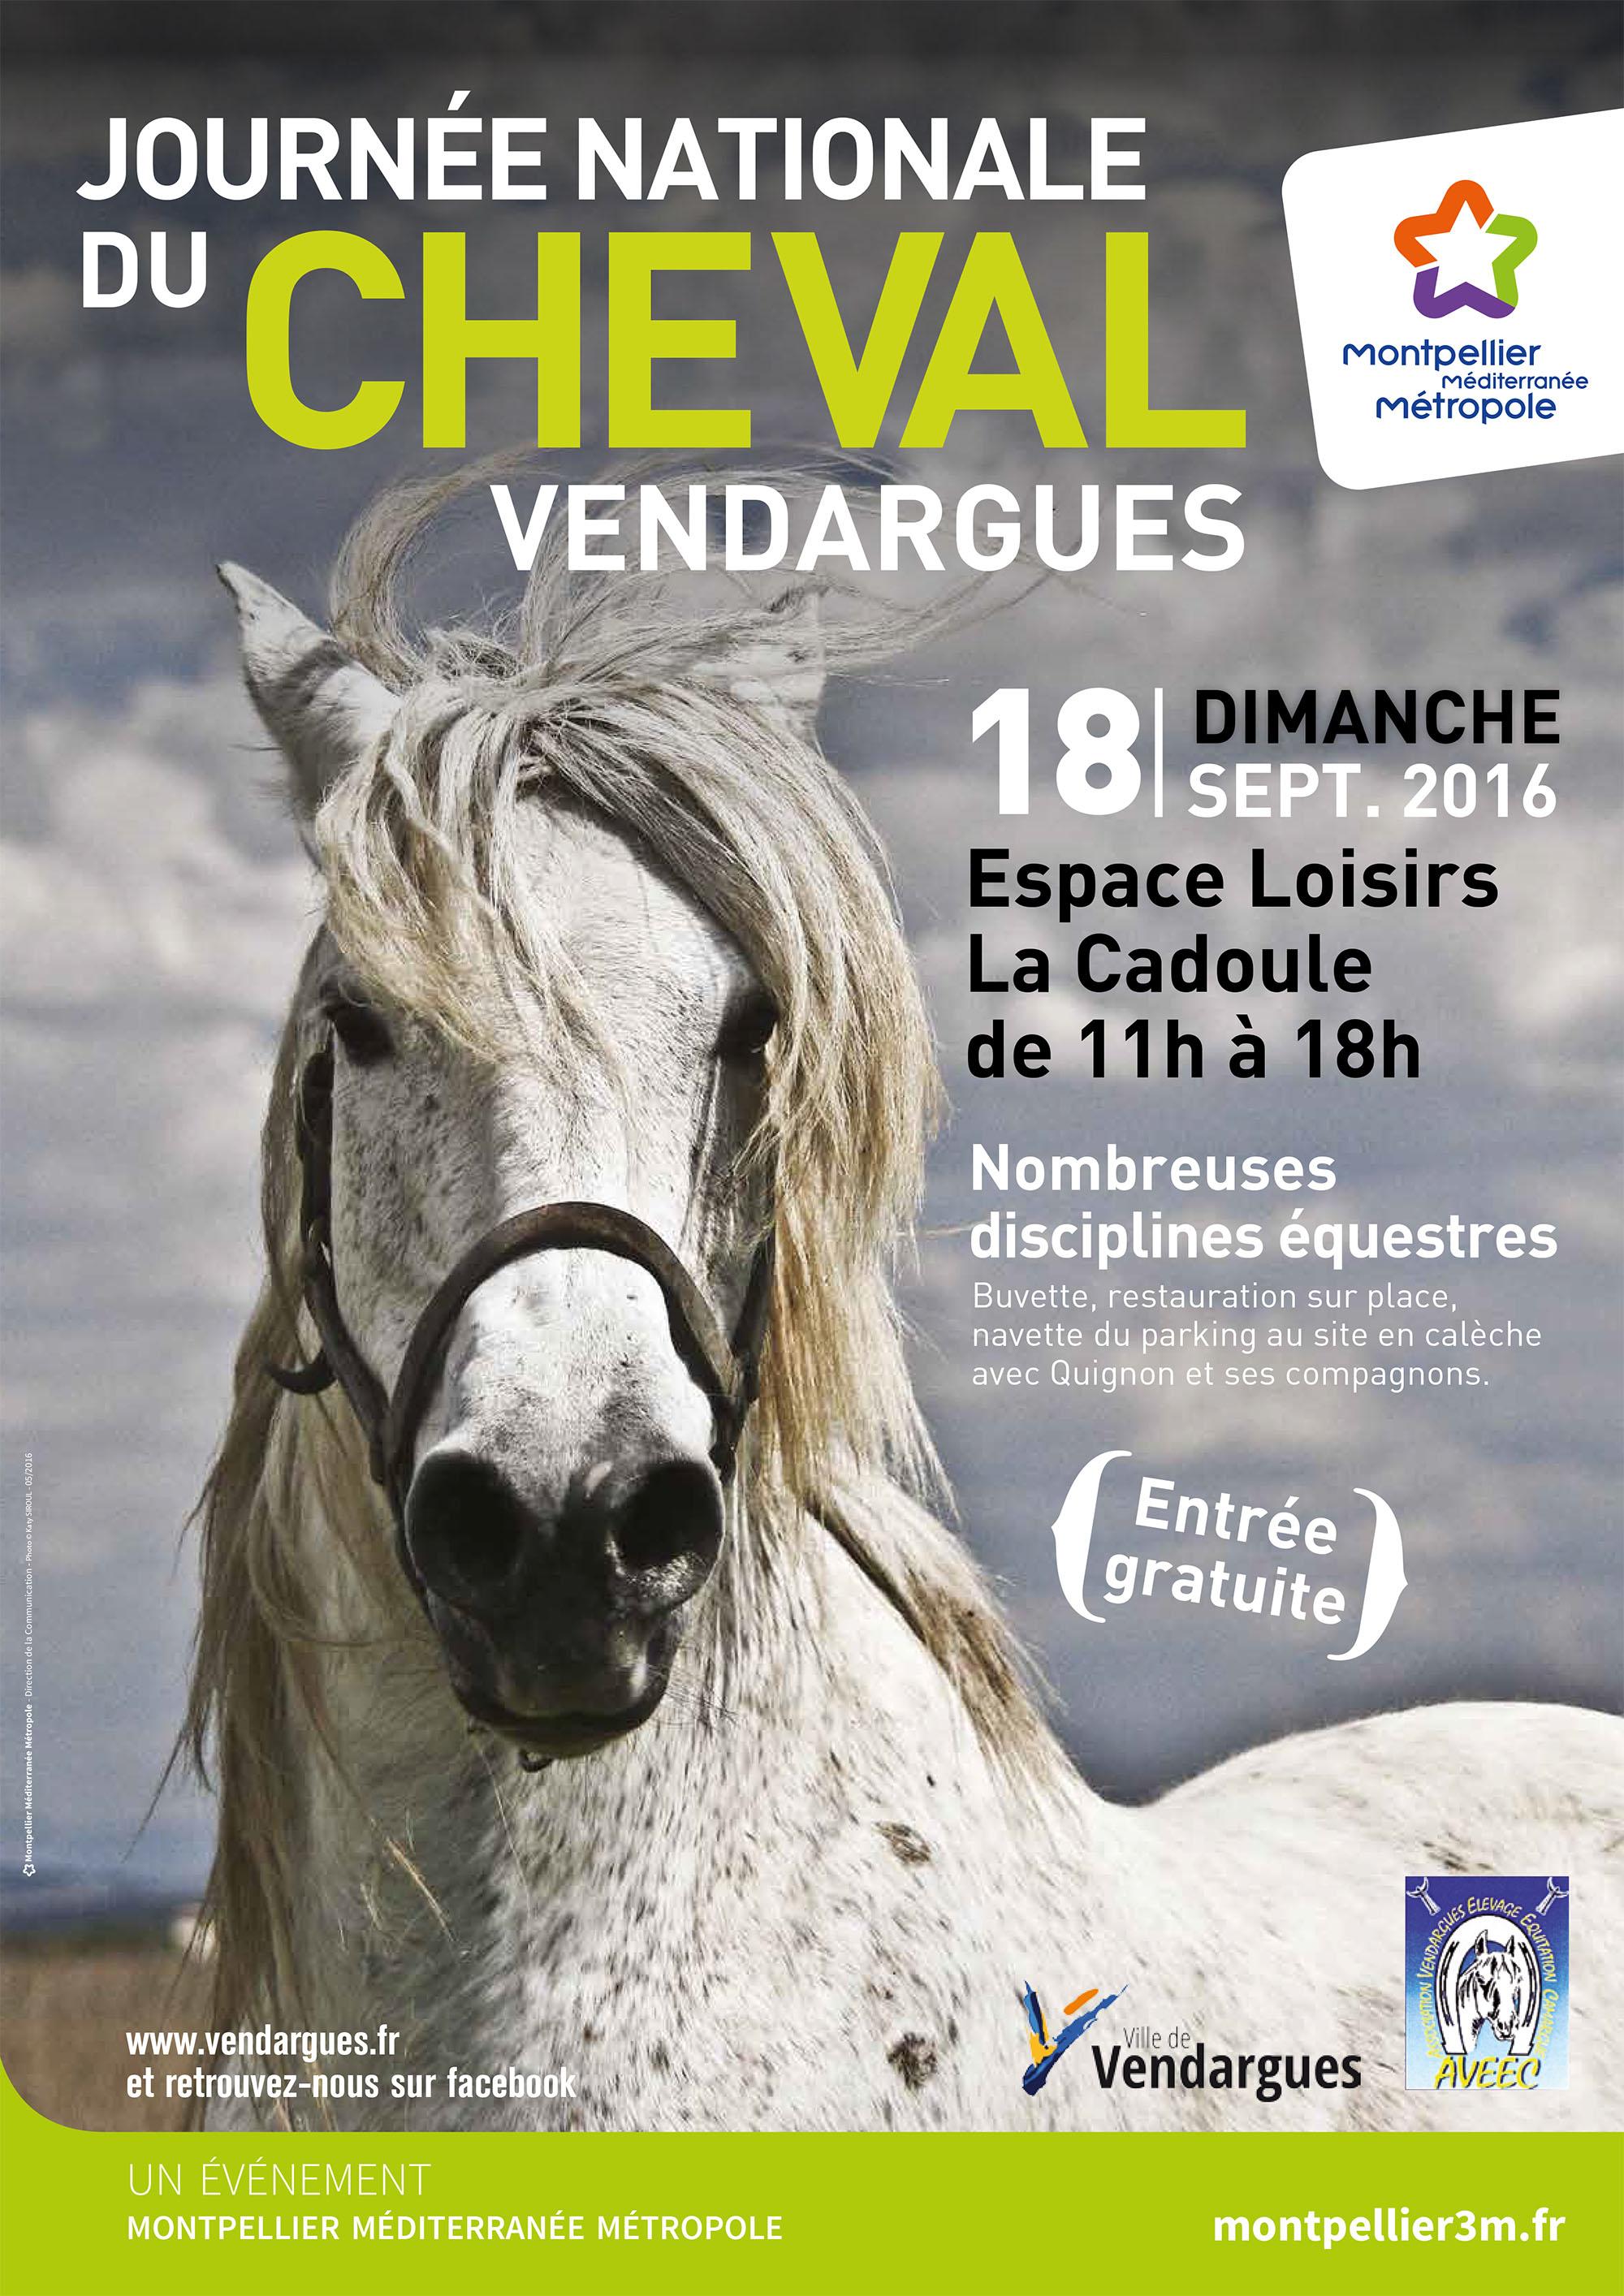 F te du cheval 2016 montpellier m diterran e m tropole - Salon du cheval montpellier ...